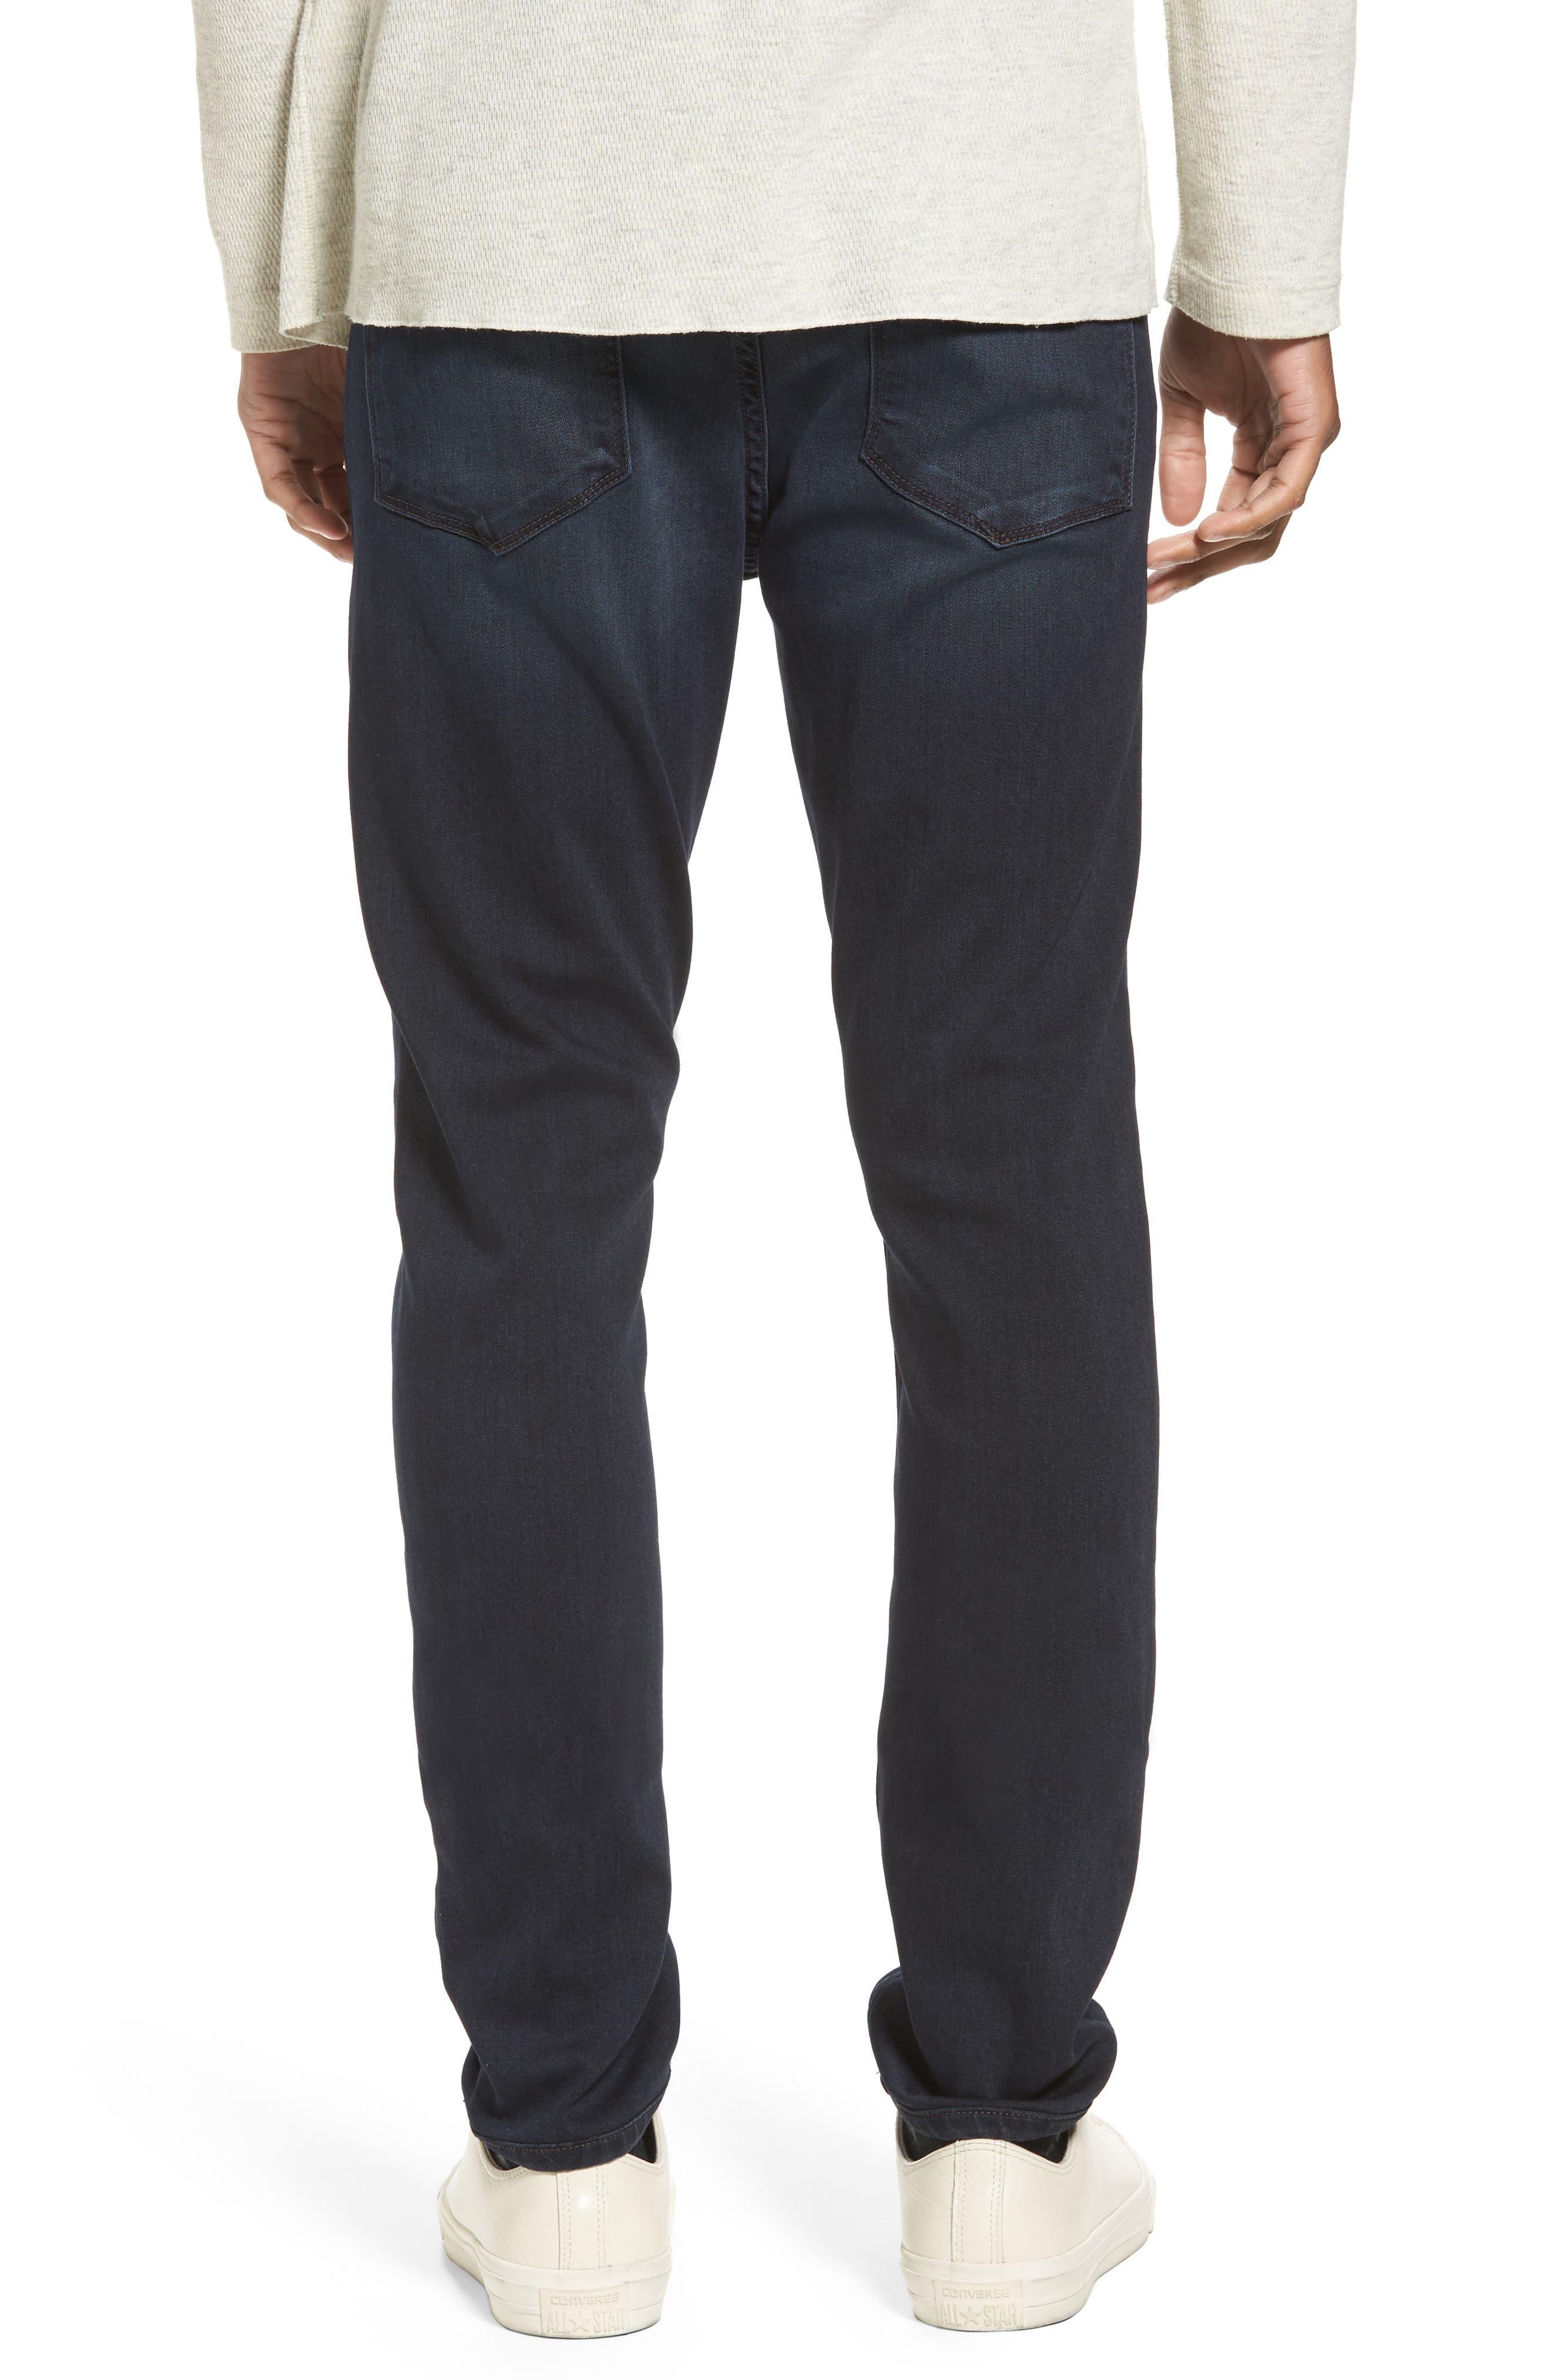 Croft Skinny Fit Jeans,                             Alternate thumbnail 2, color,                             400